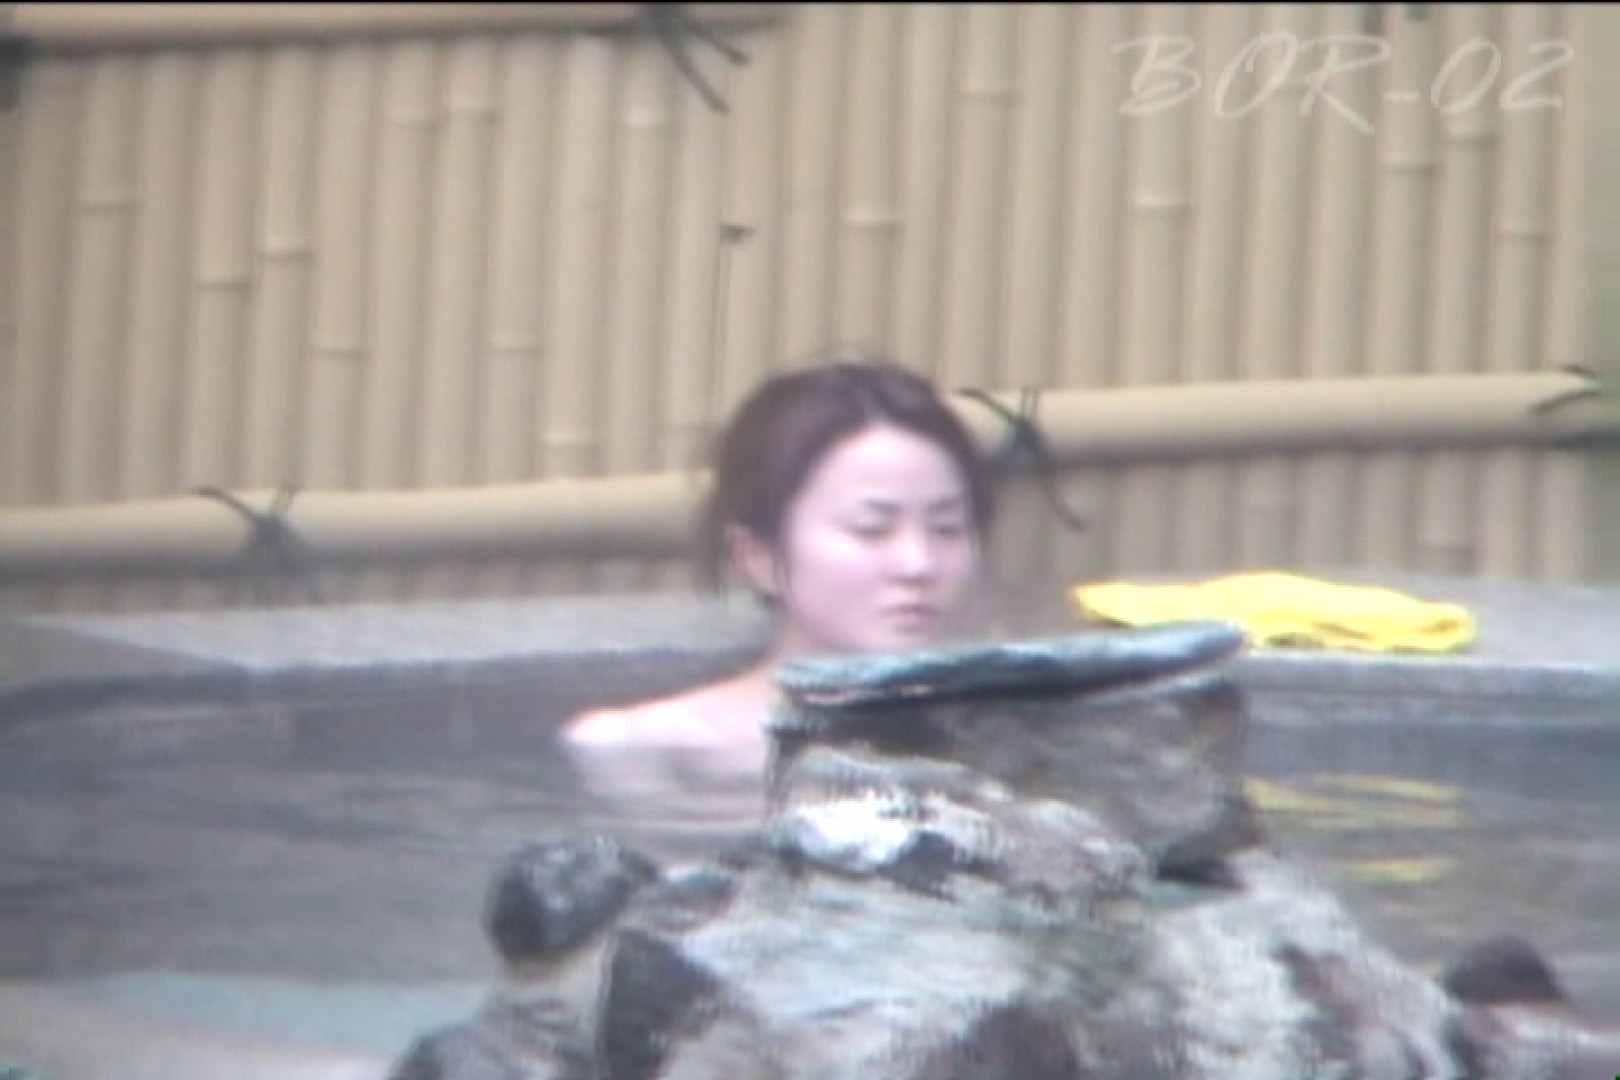 Aquaな露天風呂Vol.474 盗撮  31連発 11